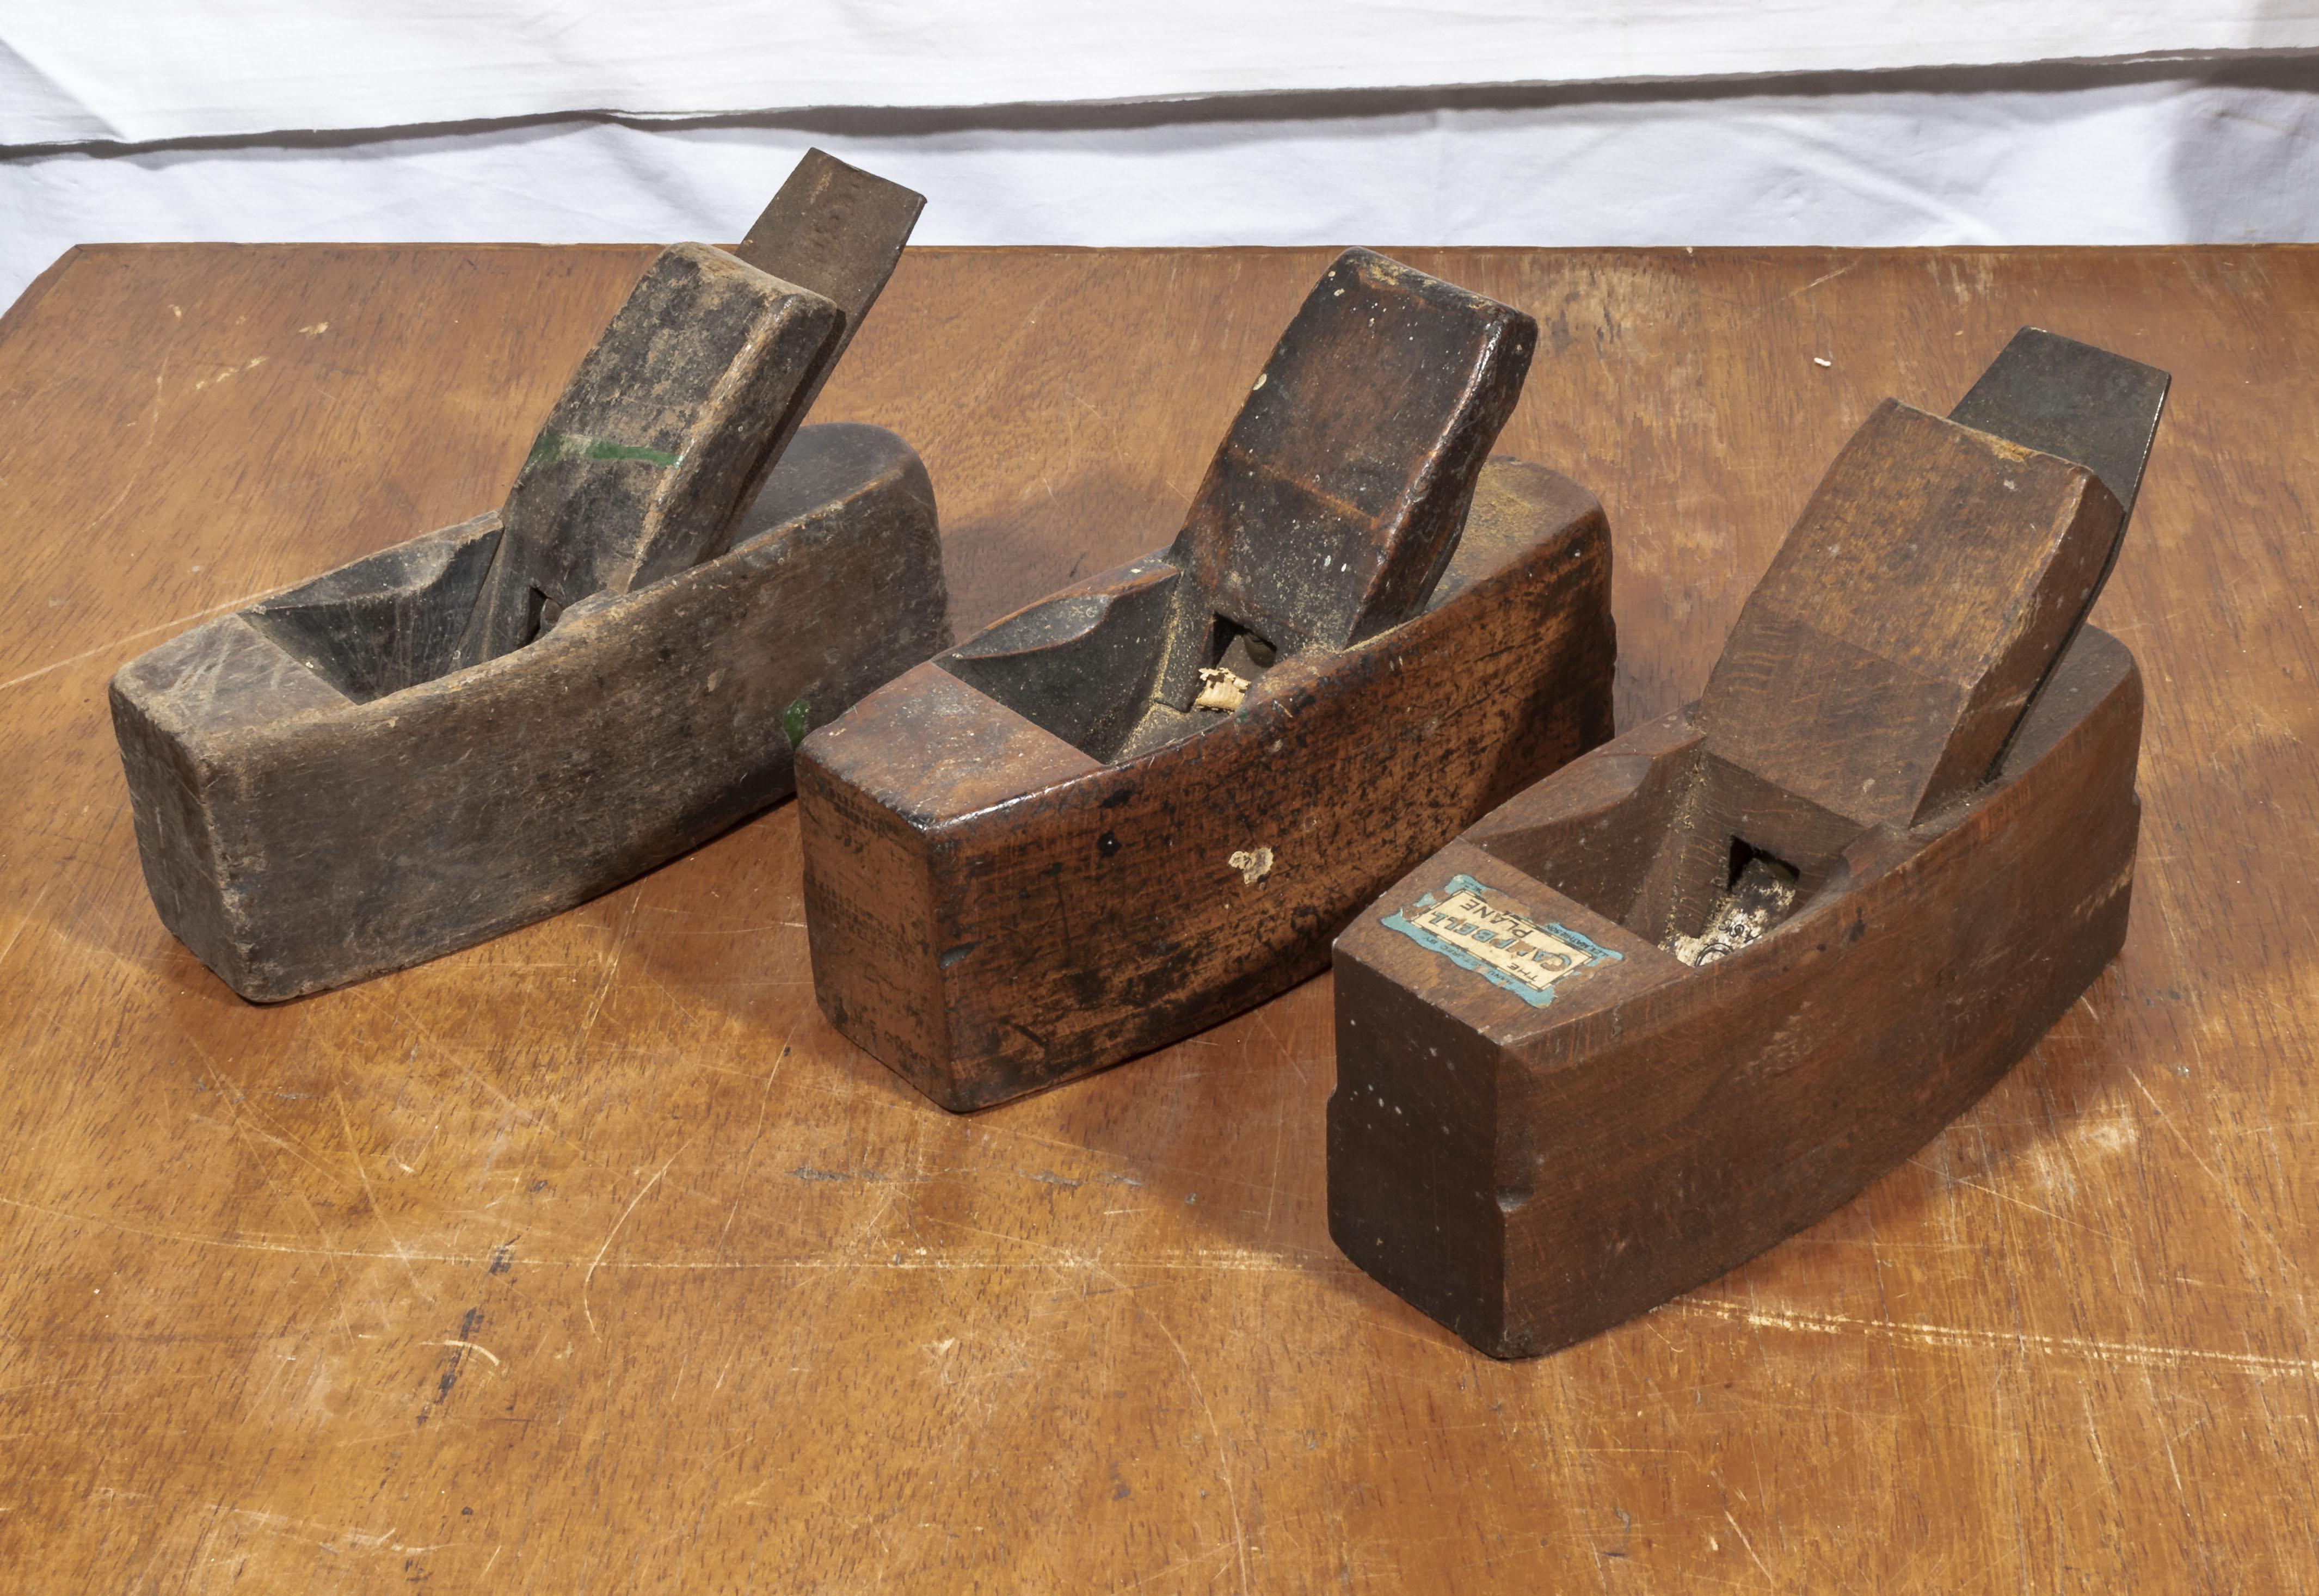 Three vintage wooden planes